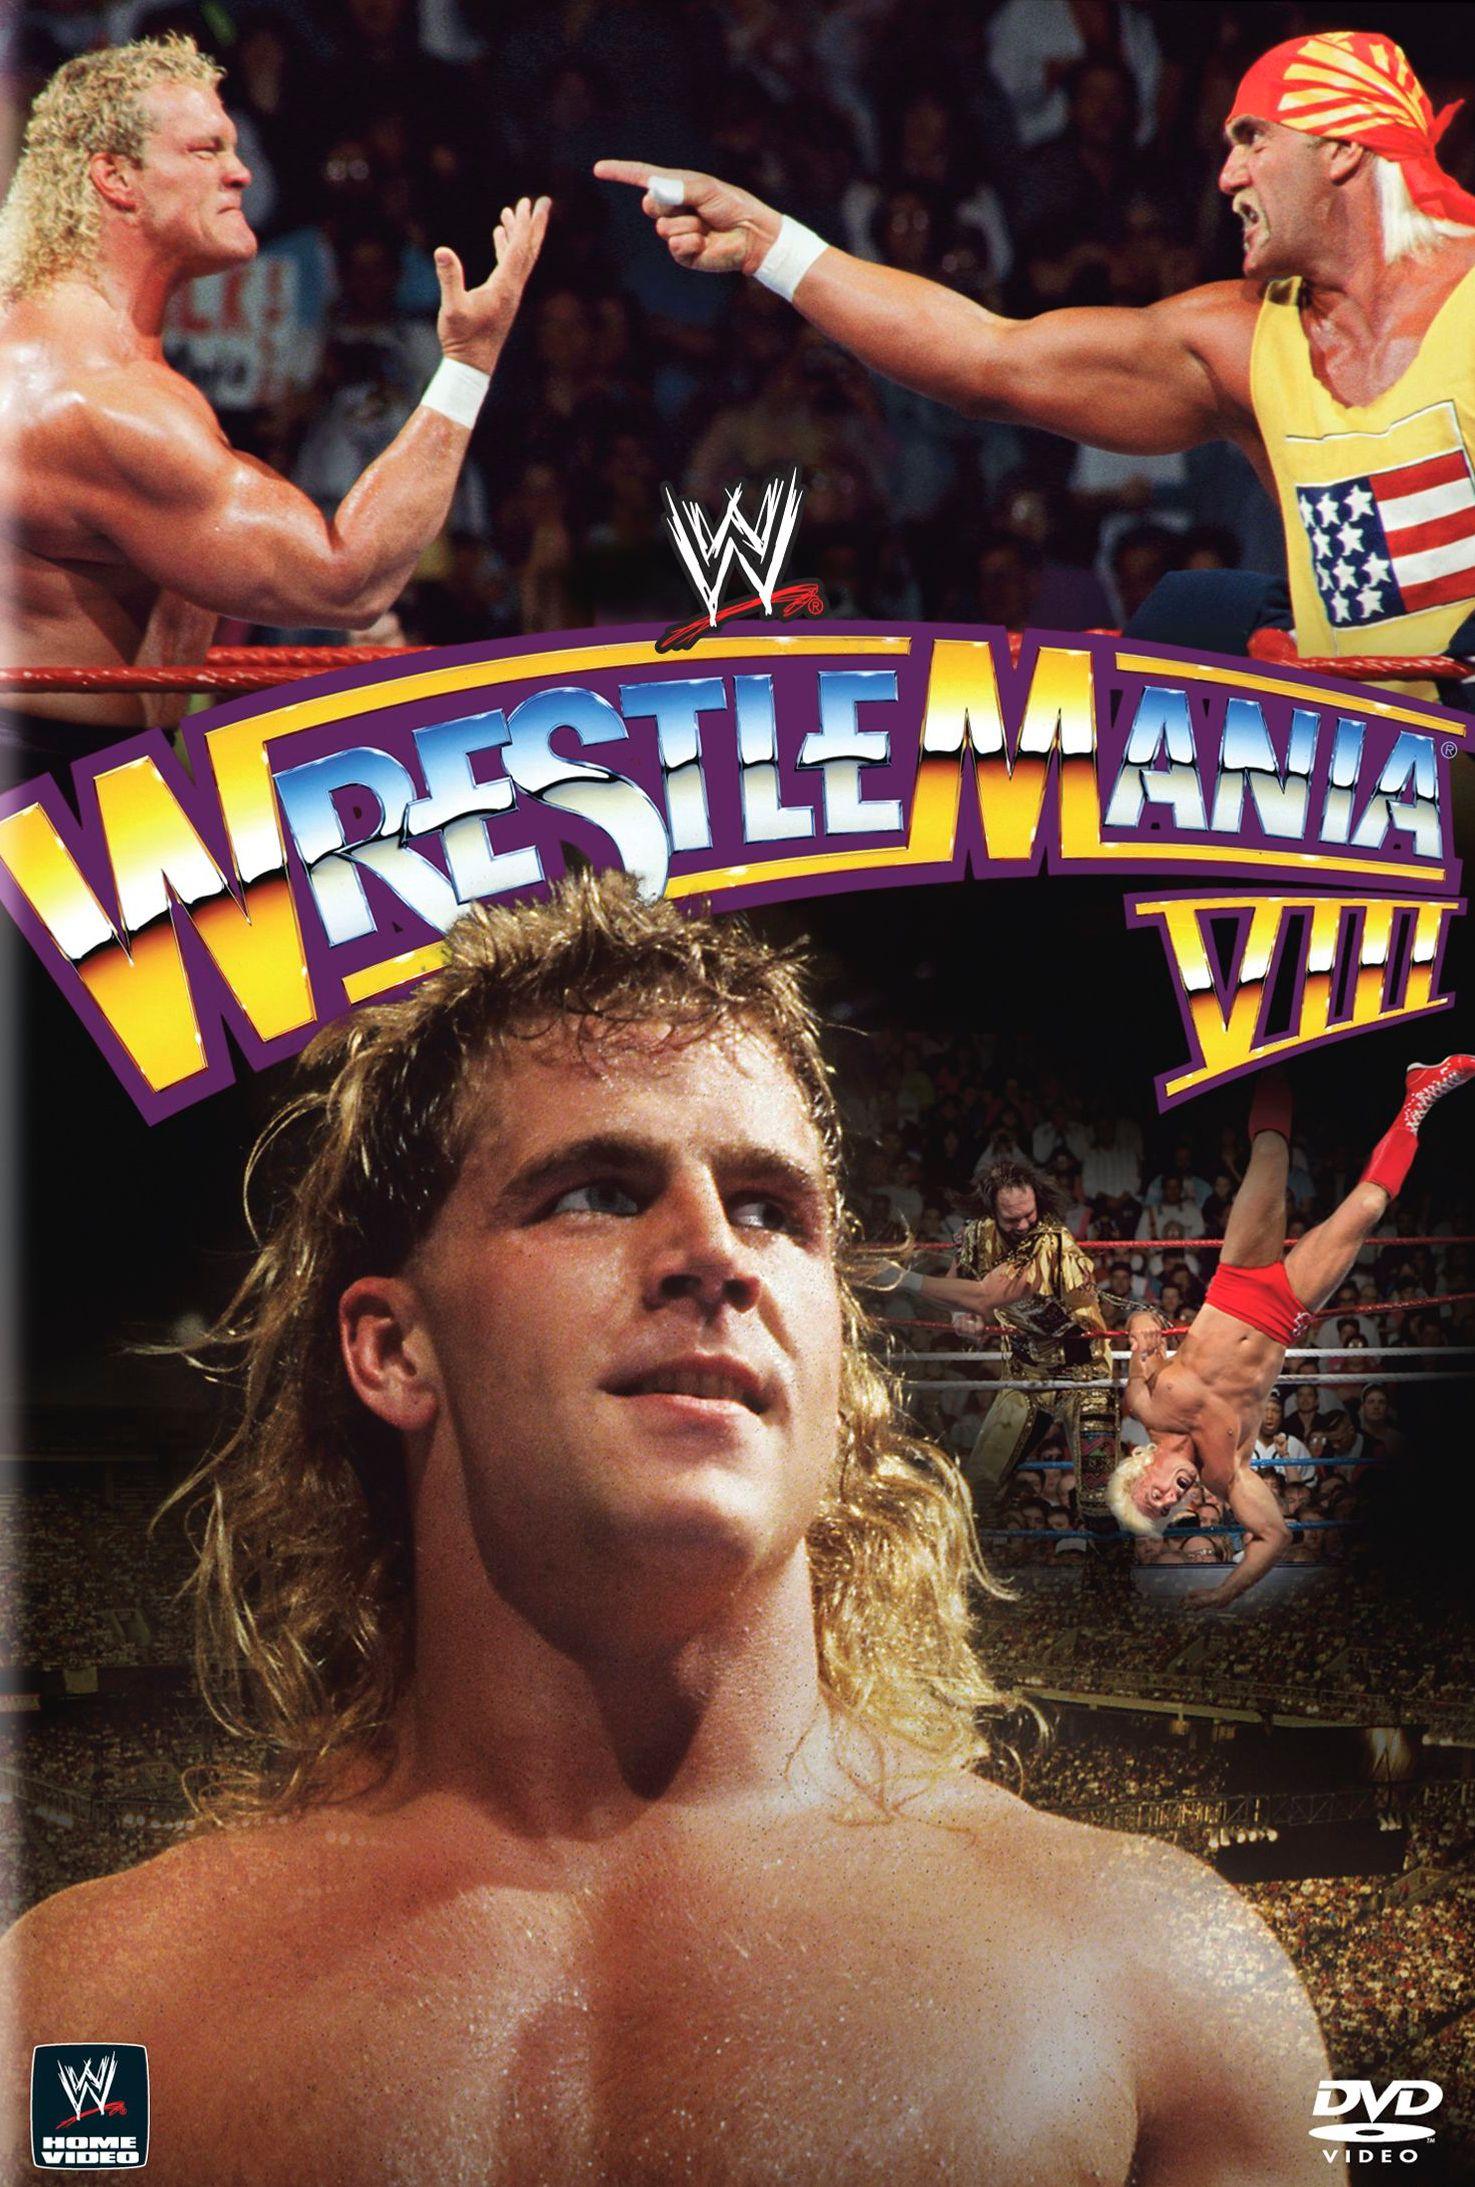 WWE: Wrestlemania VIII